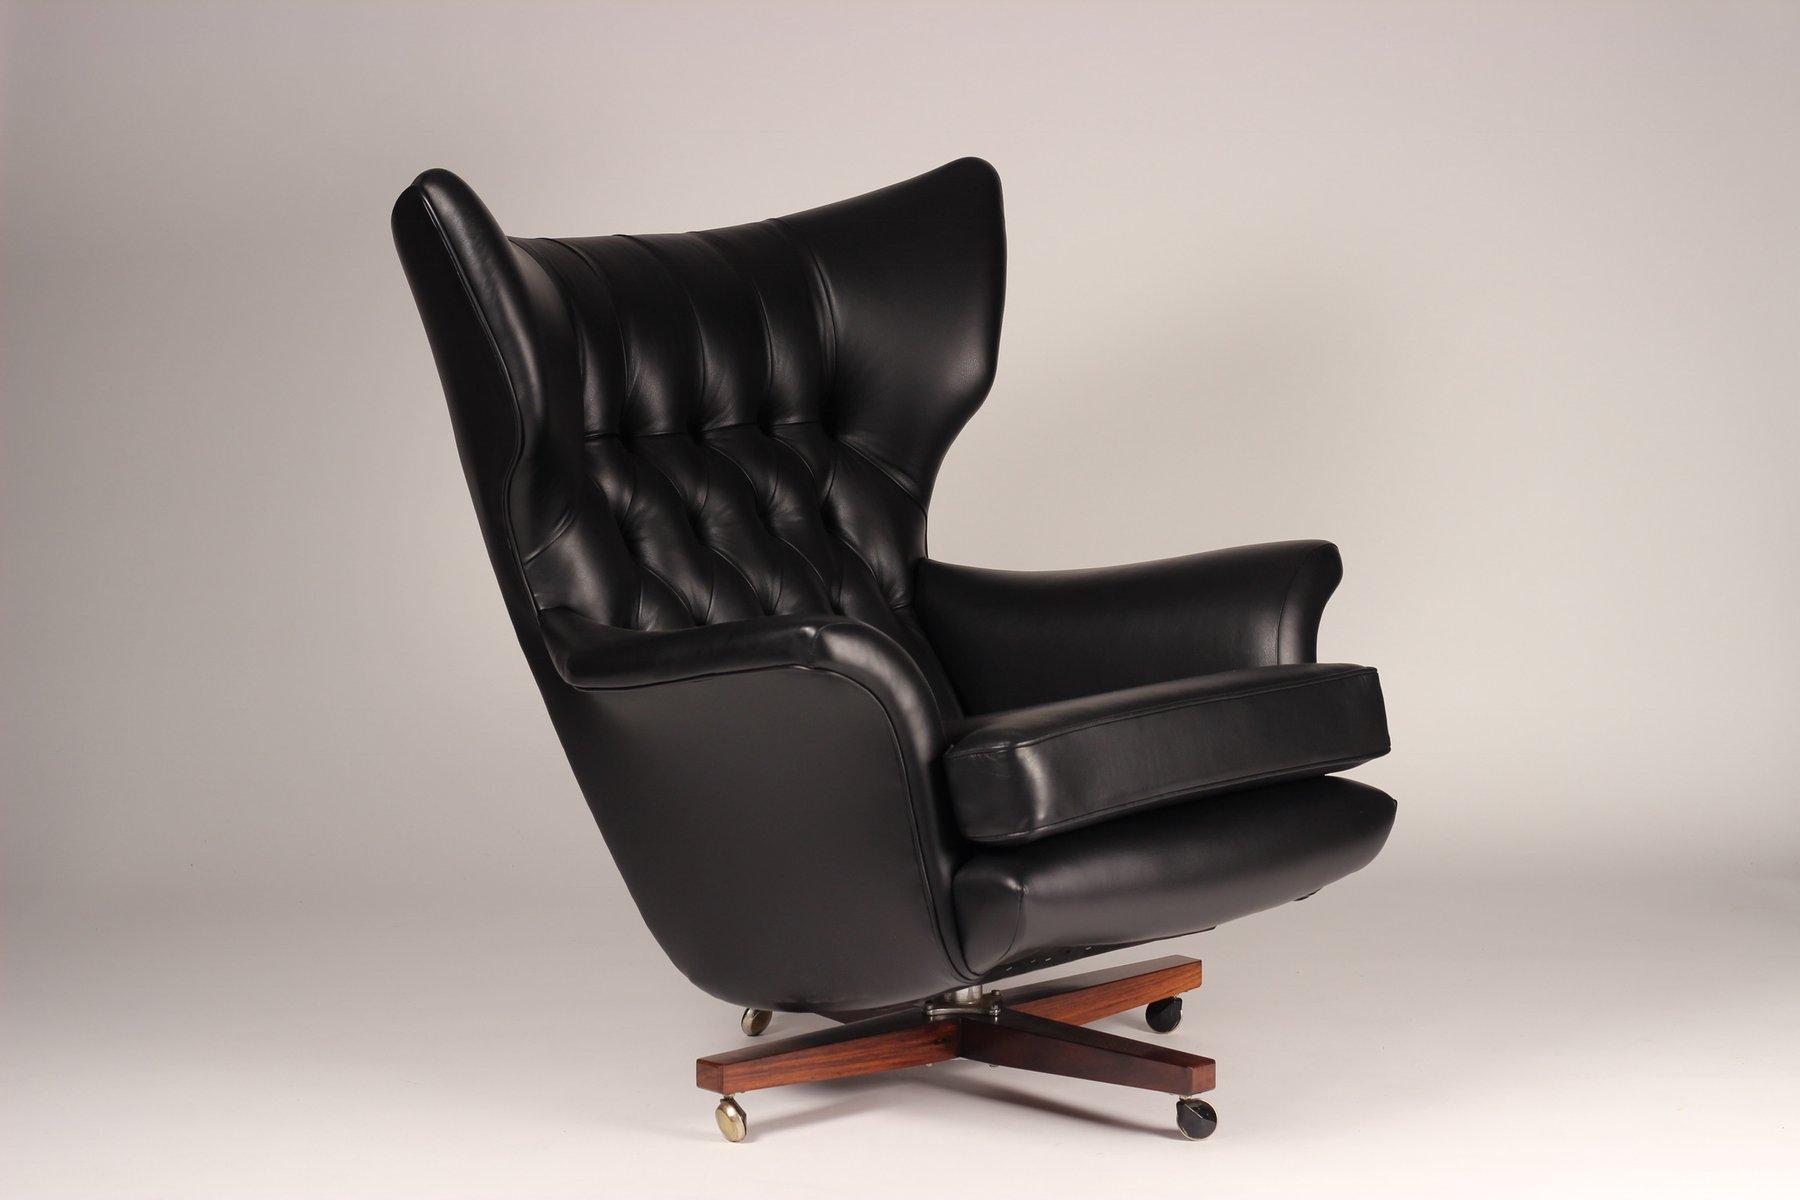 Mid Century Modern Model 62 Lounge Chair U0026 Ottoman From G Plan 10.  $5,356.00. Price Per Set